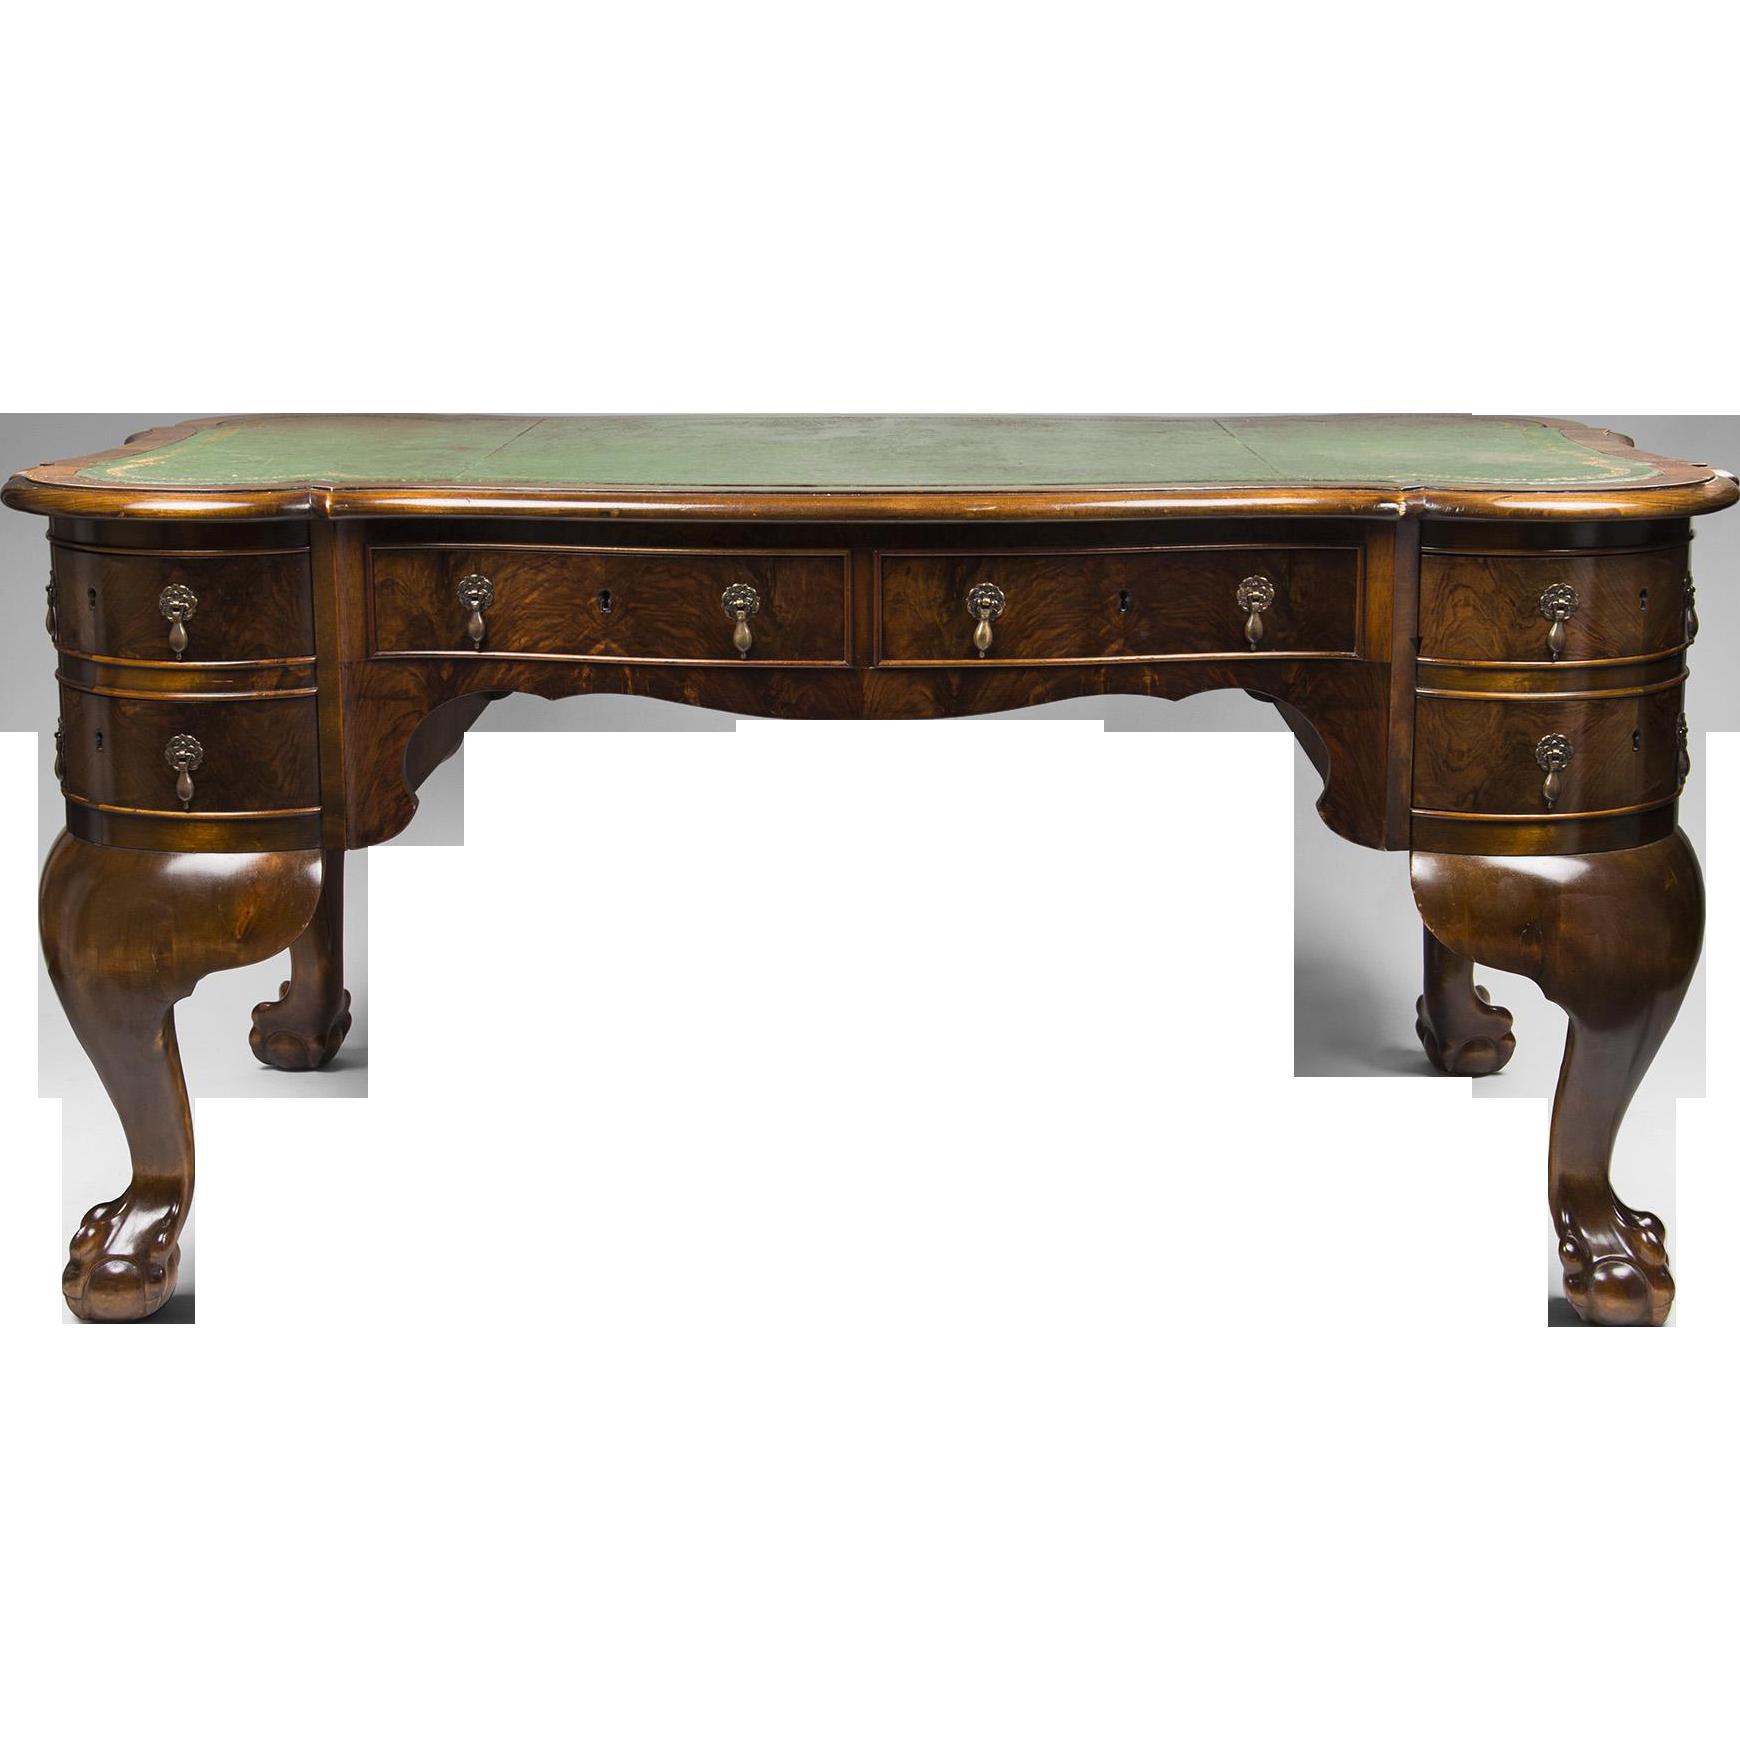 Leather Top Georgian Burr Walnut English Desk